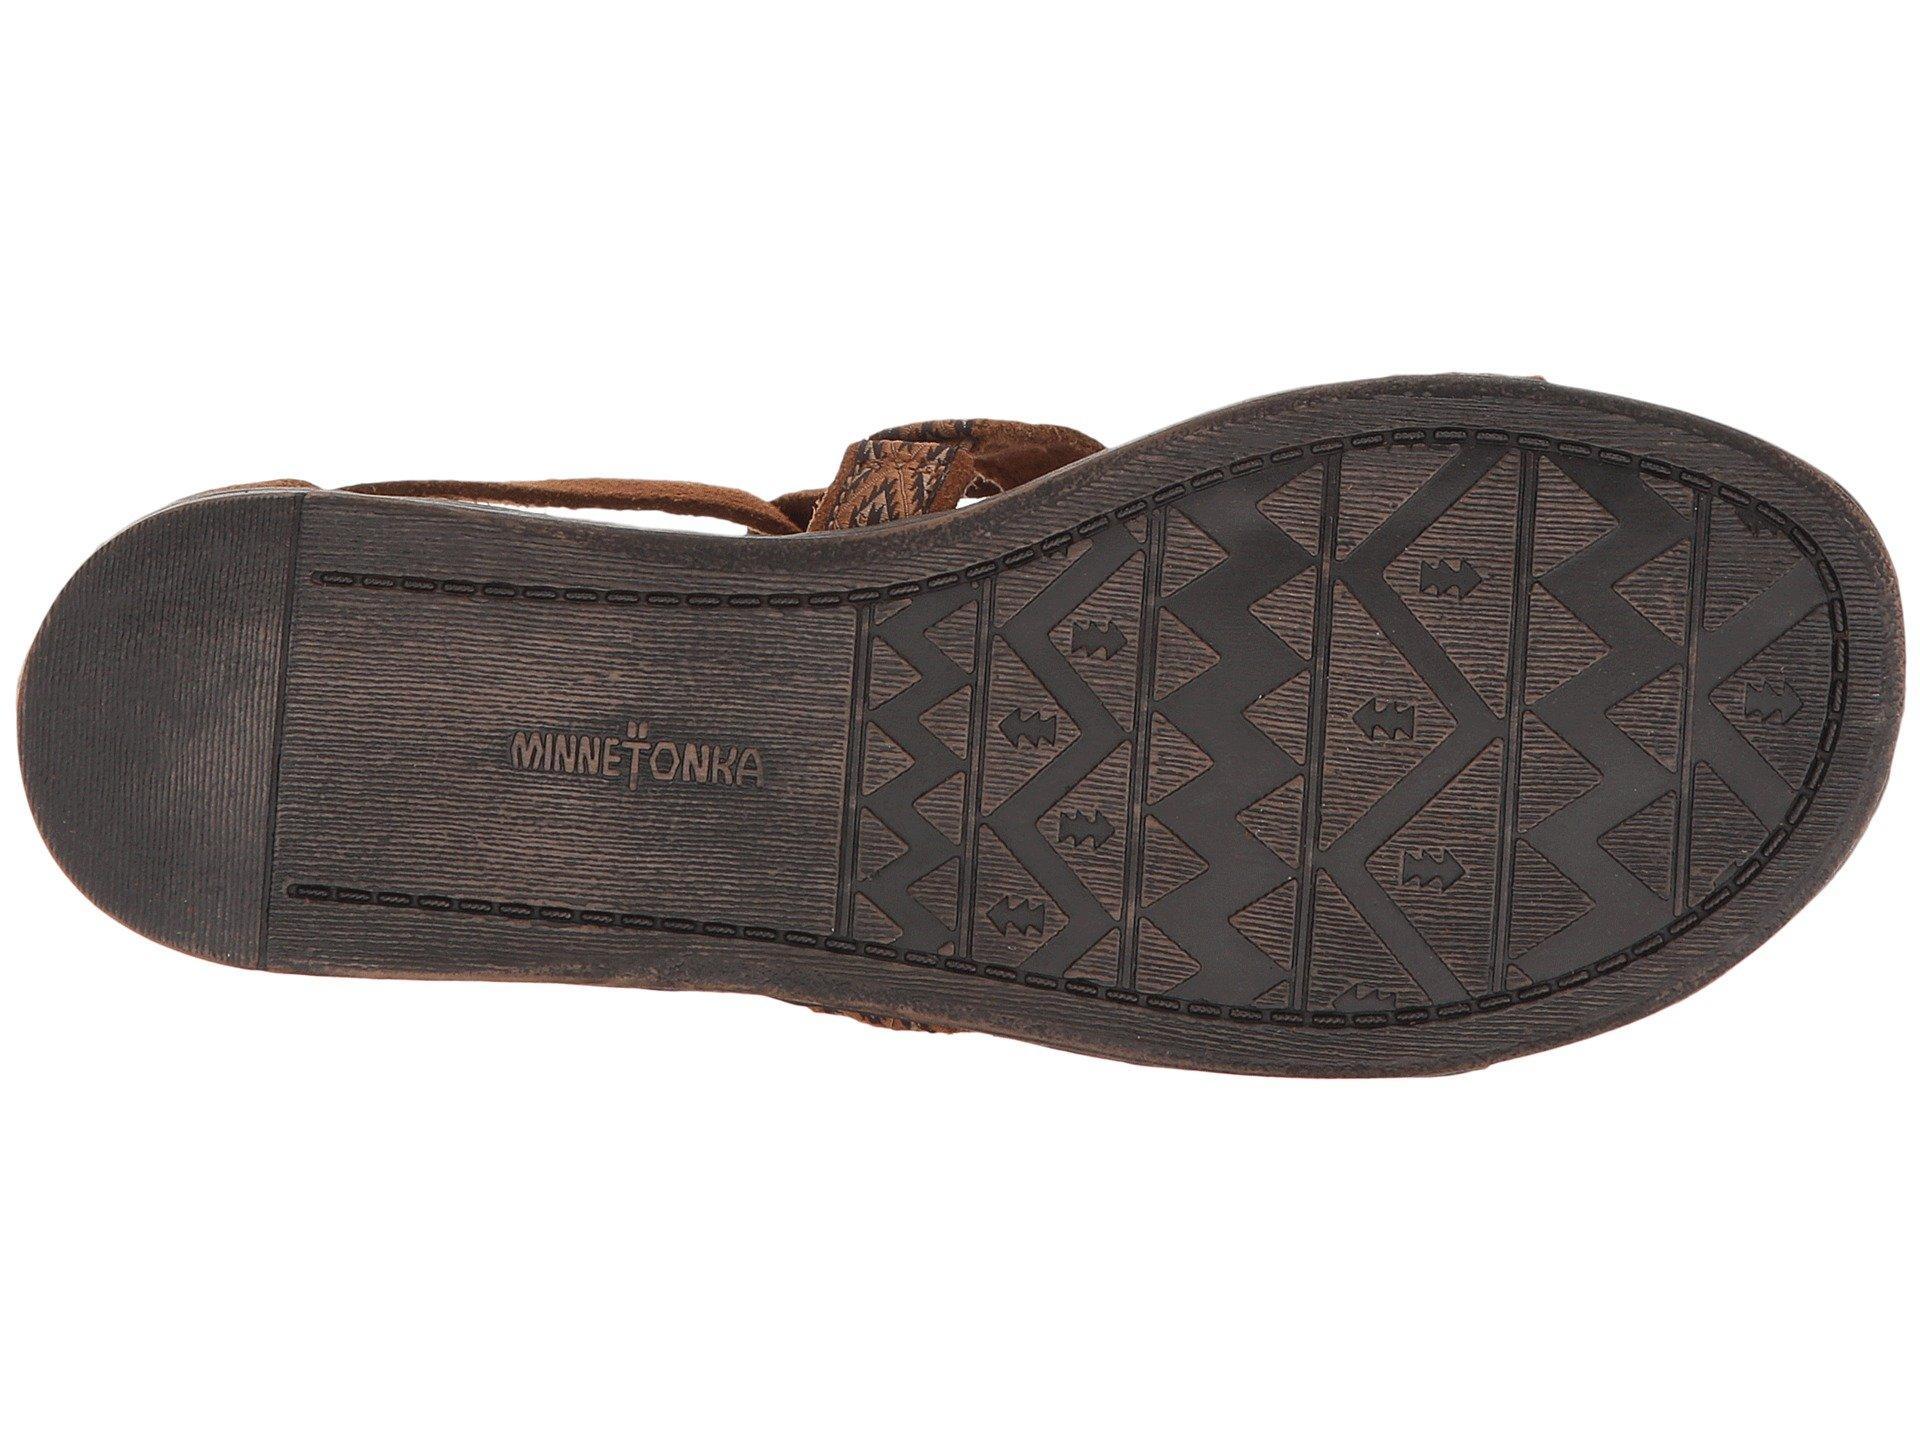 Shoe bank stillwater ok coupons